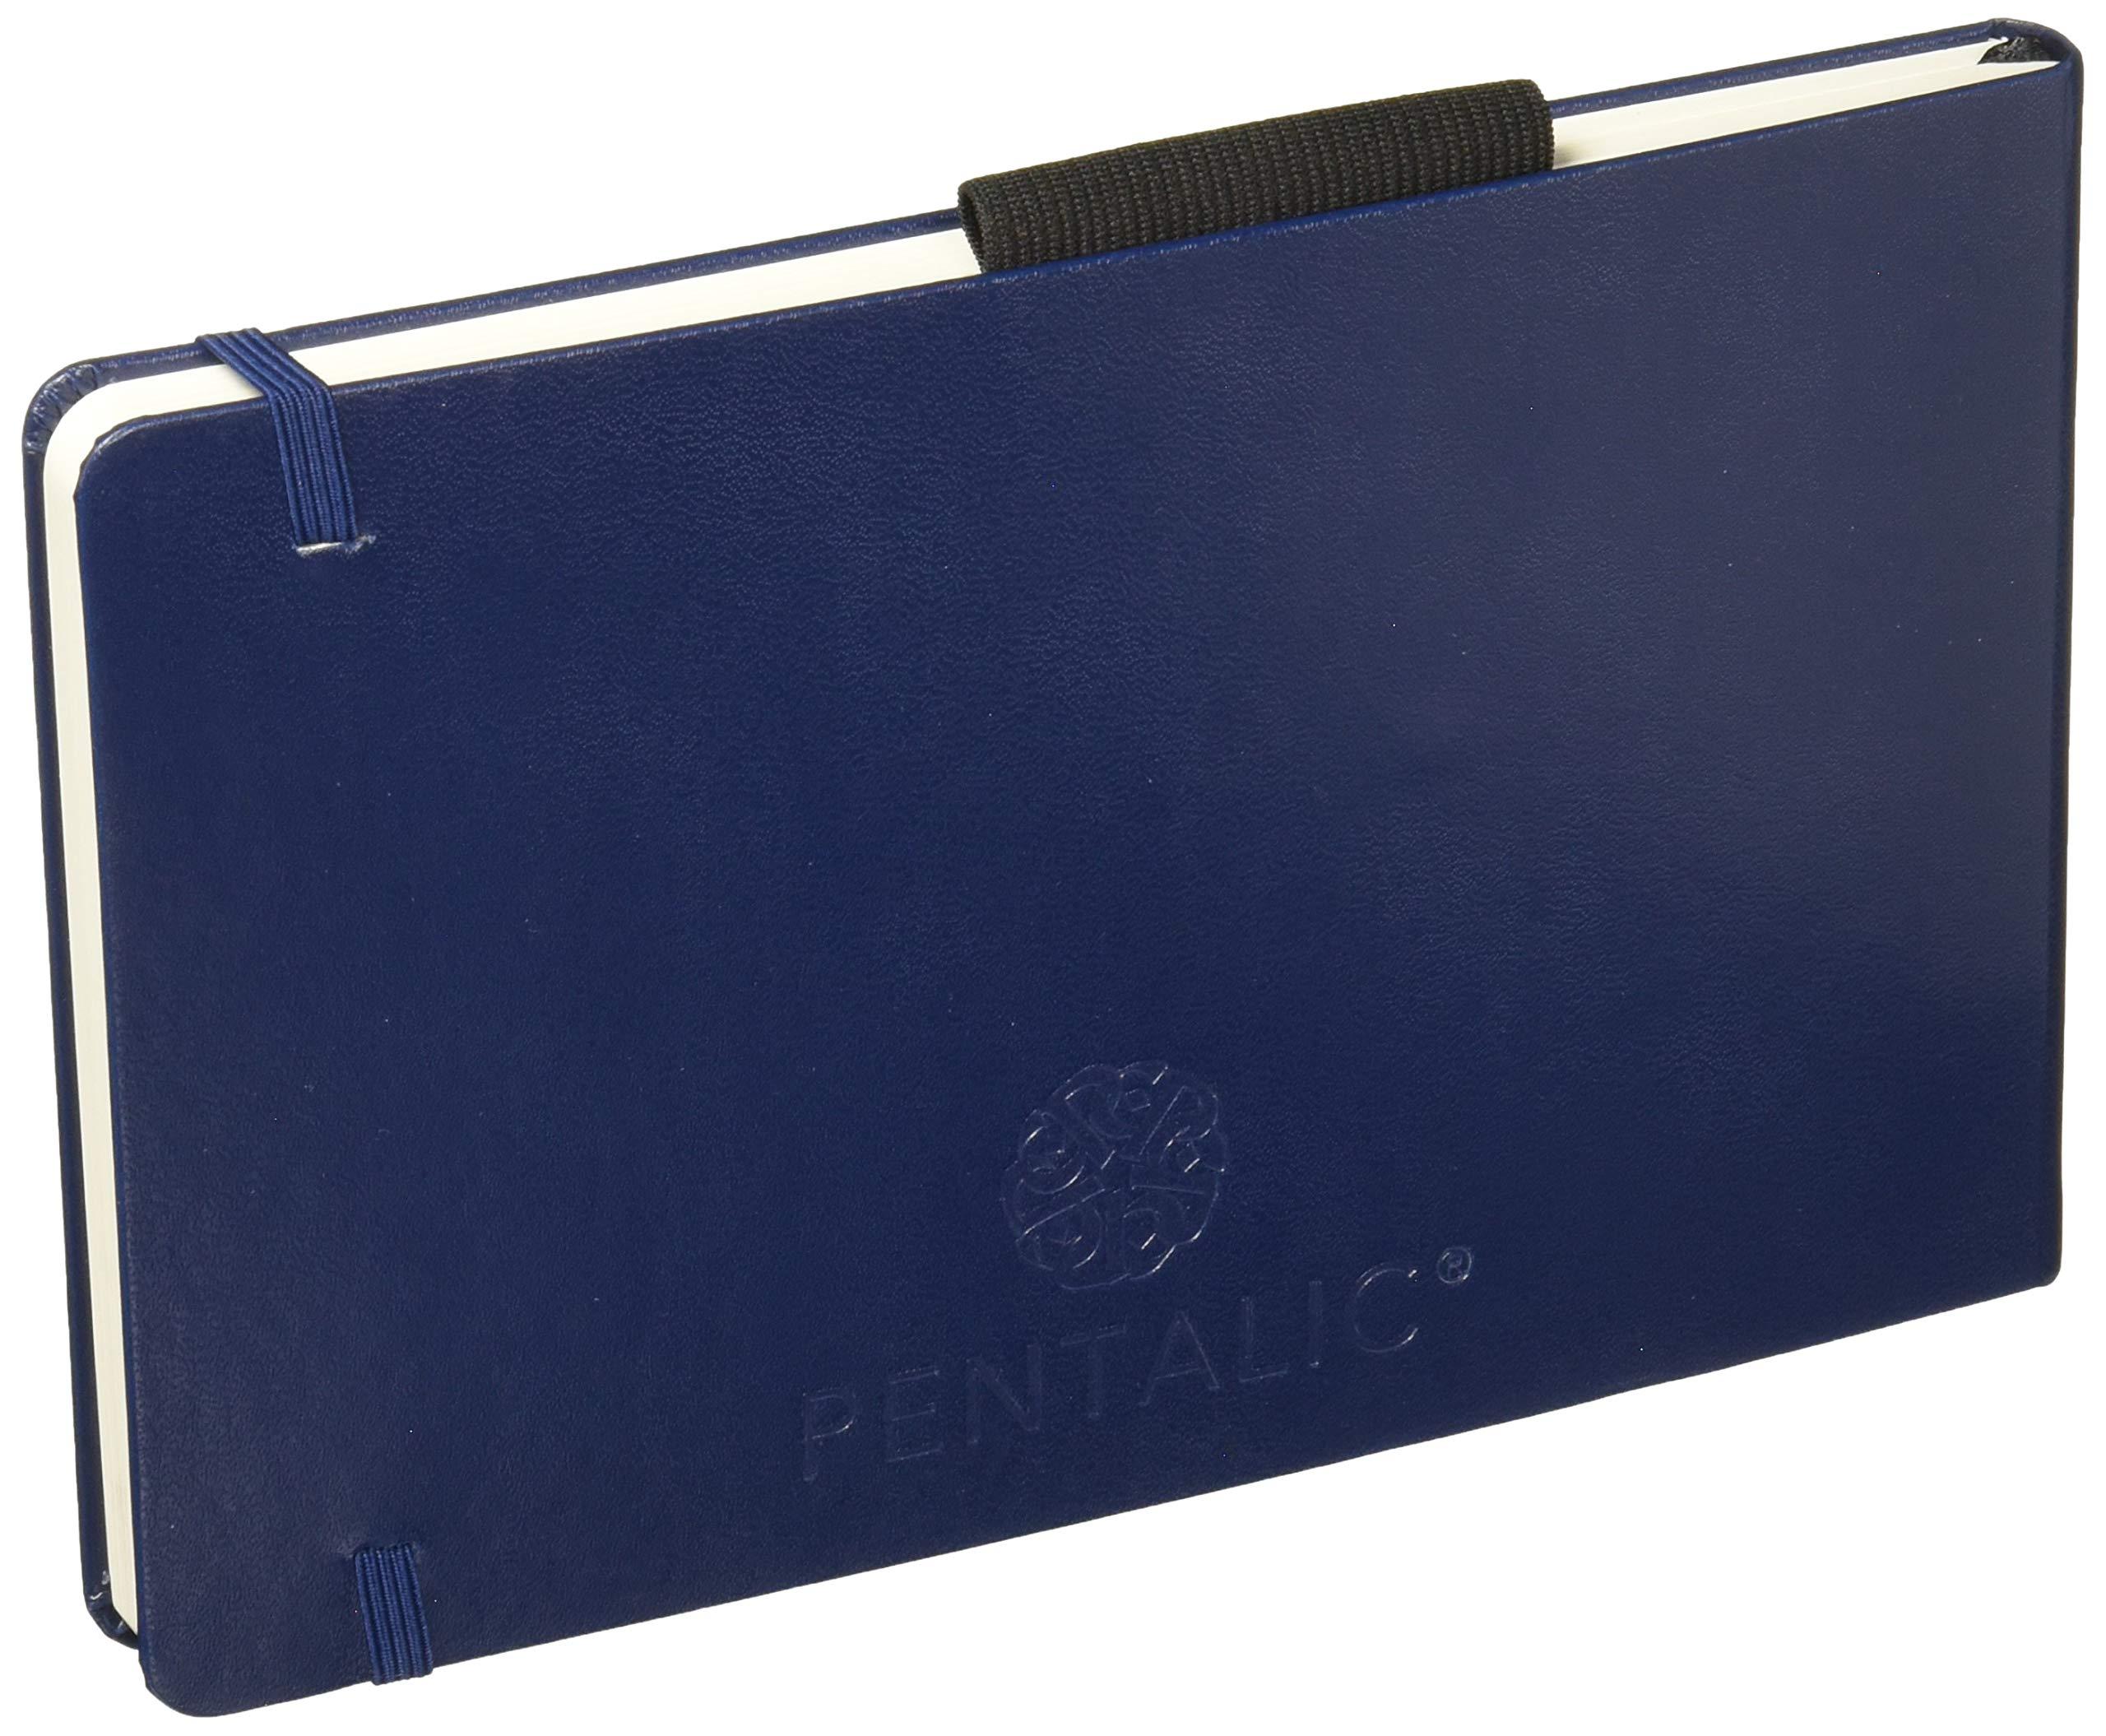 Pentalic 5'' x 8'' 140 lb. (300 gsm) AF Aqua Journal 48 Page Book